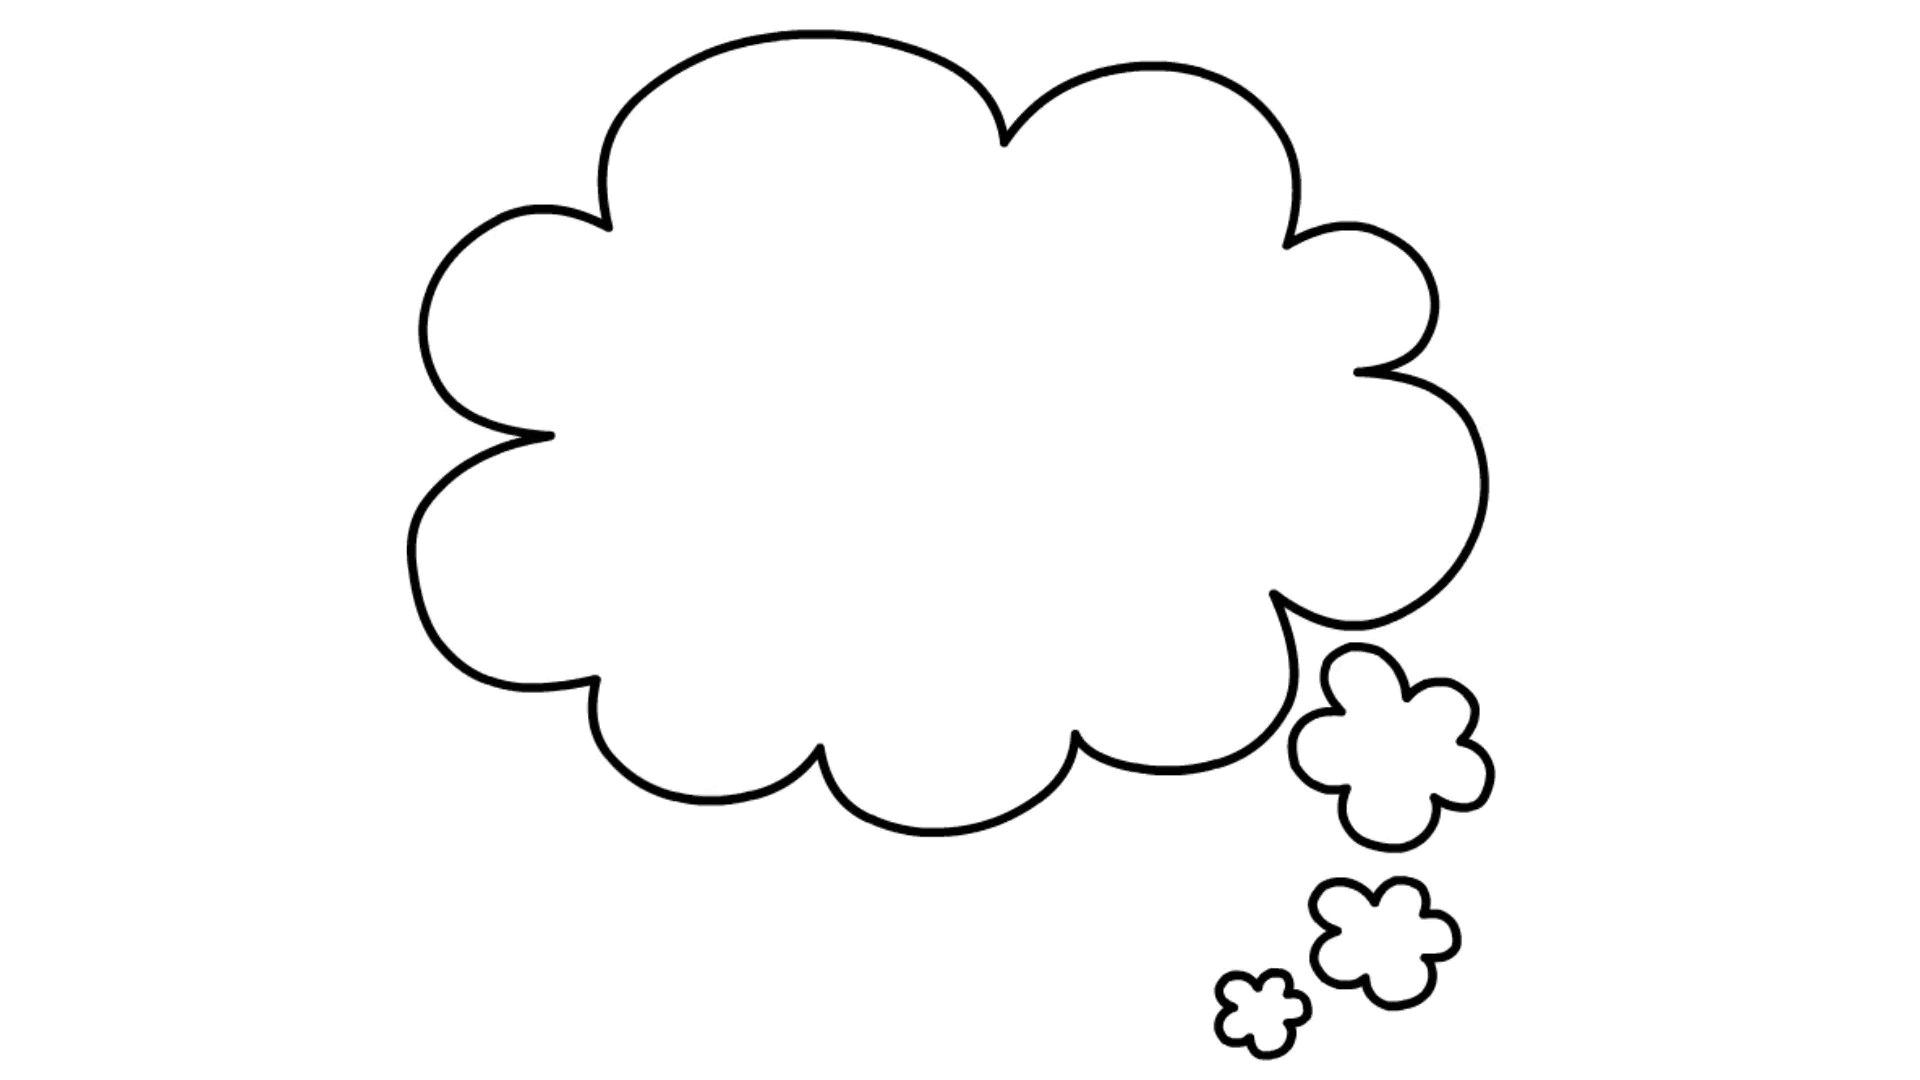 Speech Bubble Download PNG Image PNG, SVG Clip art for Web ...